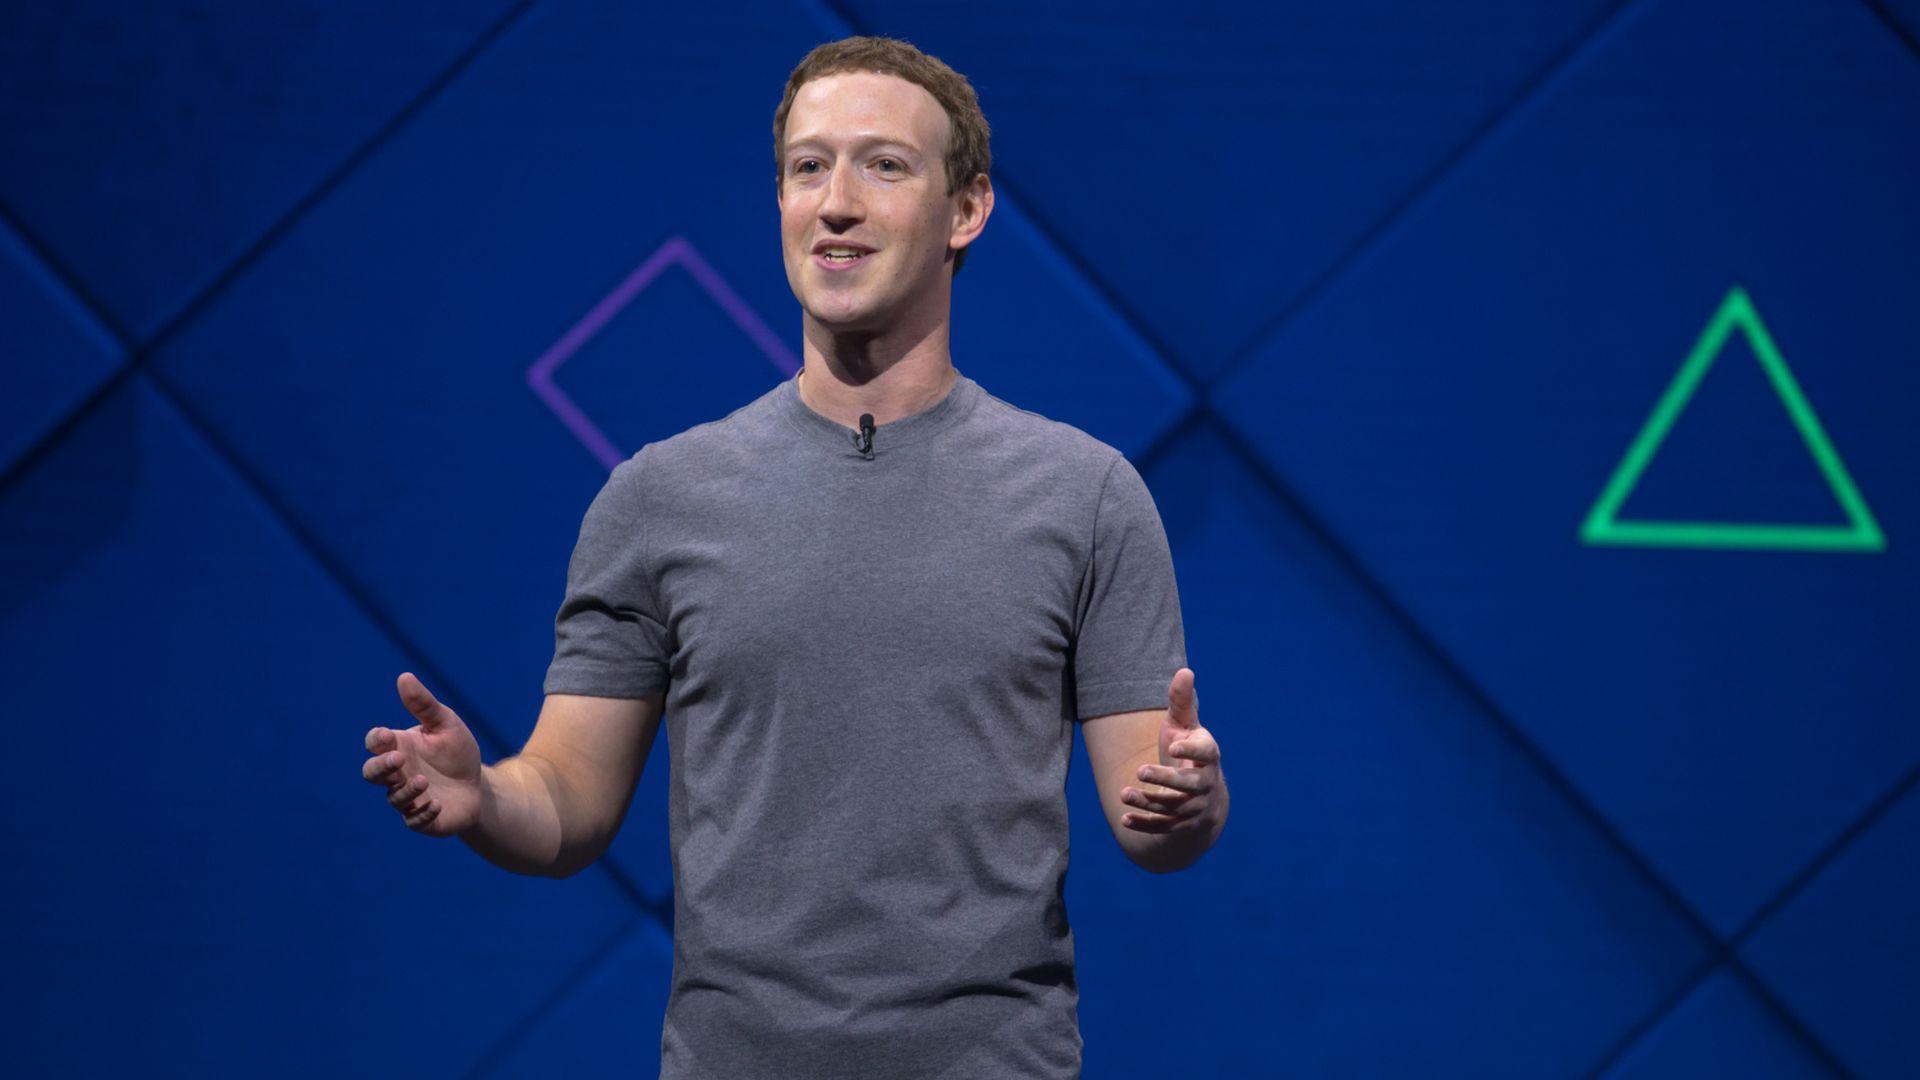 Zuckerberg at F8 in 2017